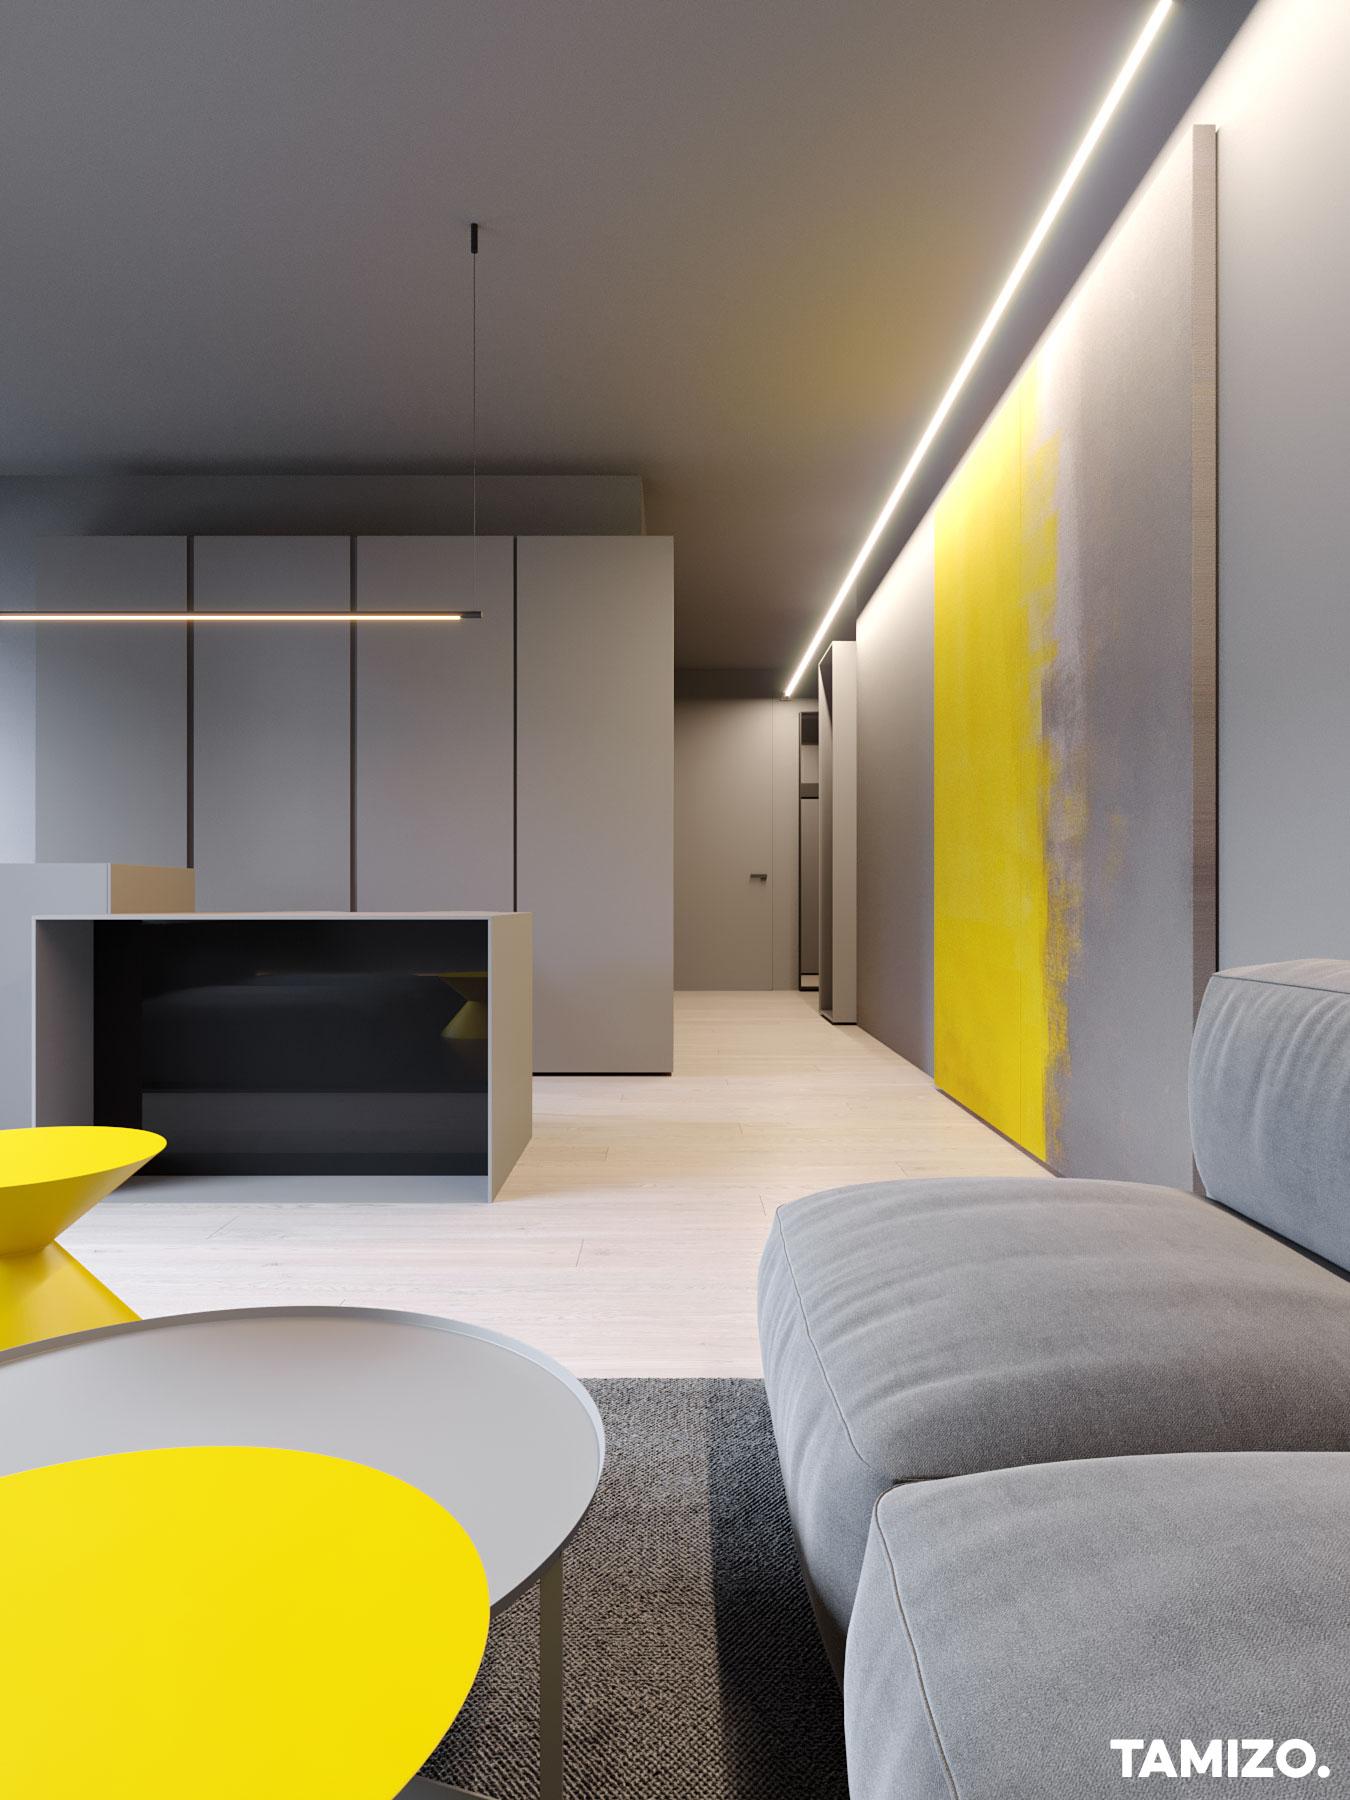 tamizo_interior_wnetrza_projekt_architekci_mateusz_kuo_stolarski_lodz_03